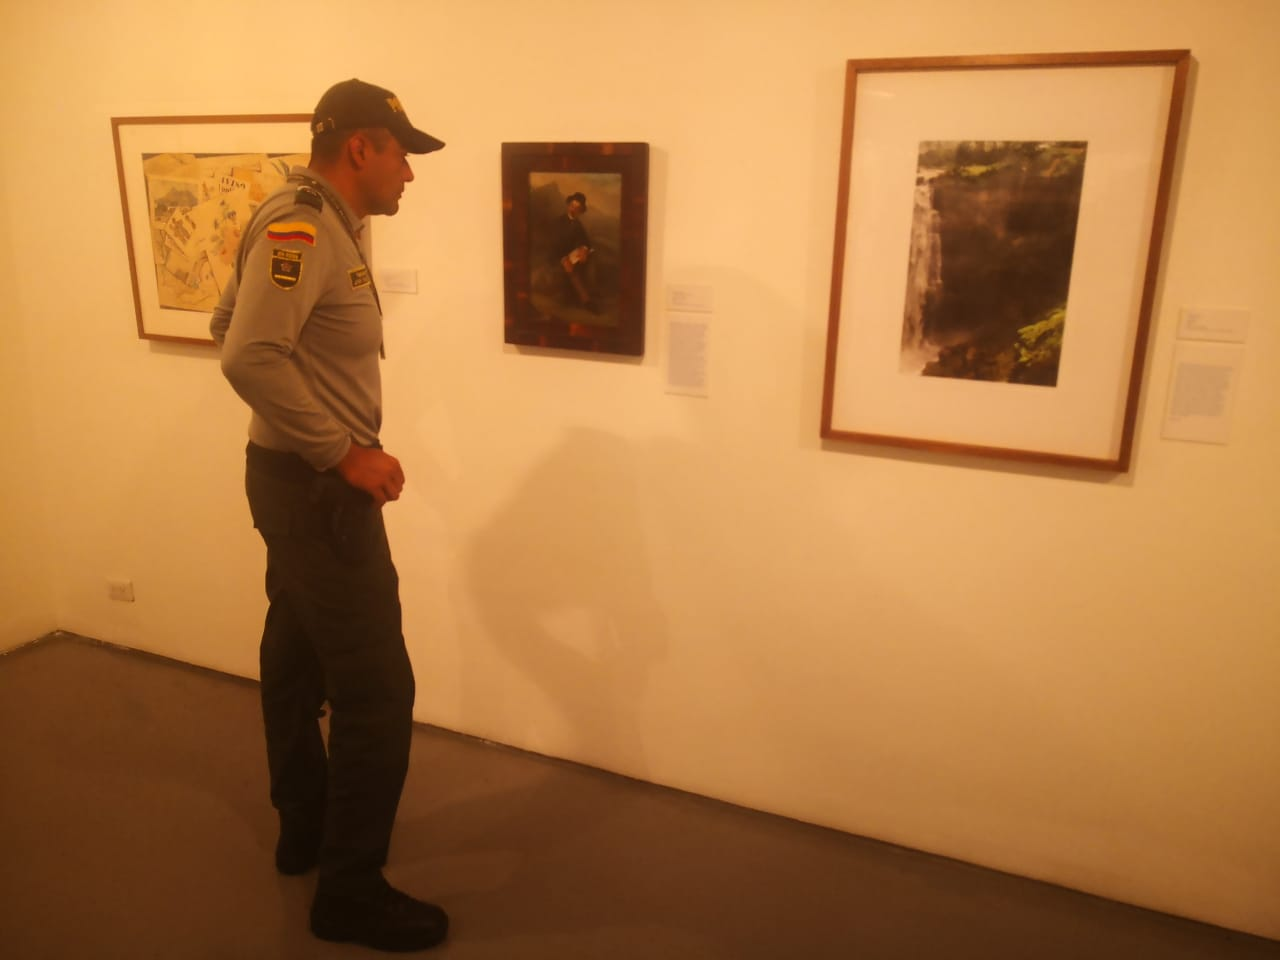 Policía realizó controles a obras de artes